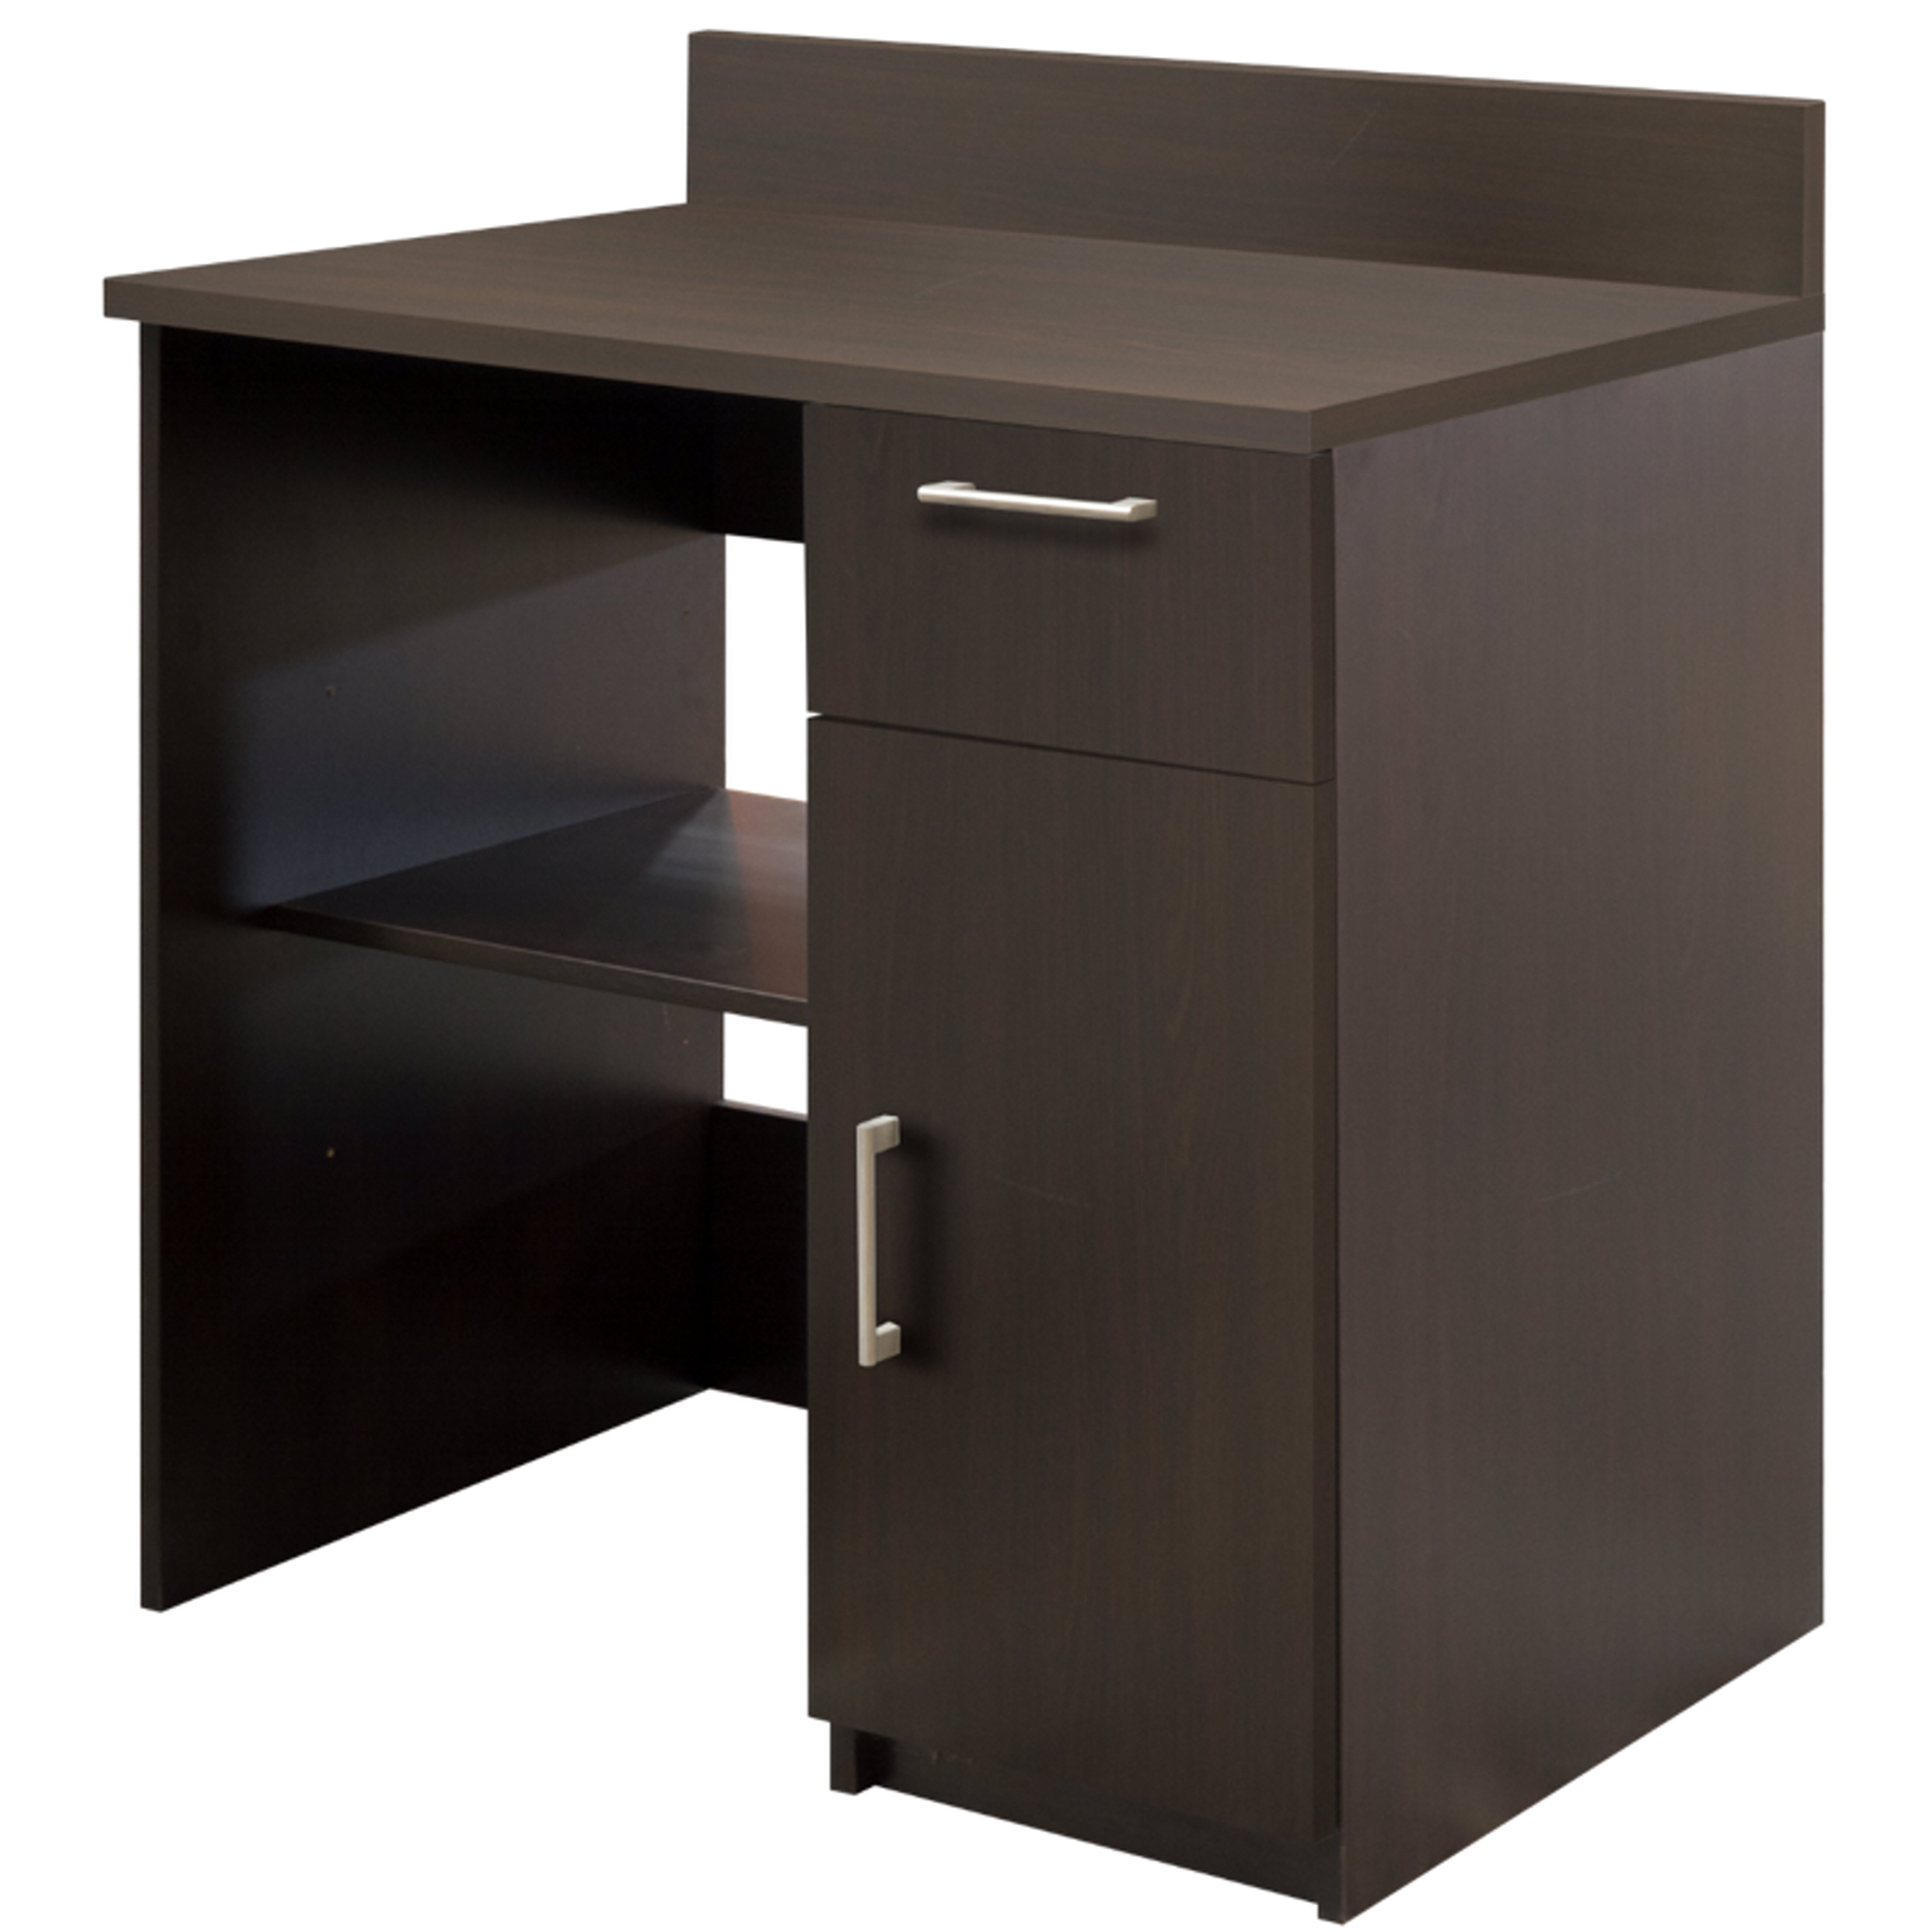 75 x 35 kitchen pantry cabinet wayfair for Wayfair kitchen cabinets